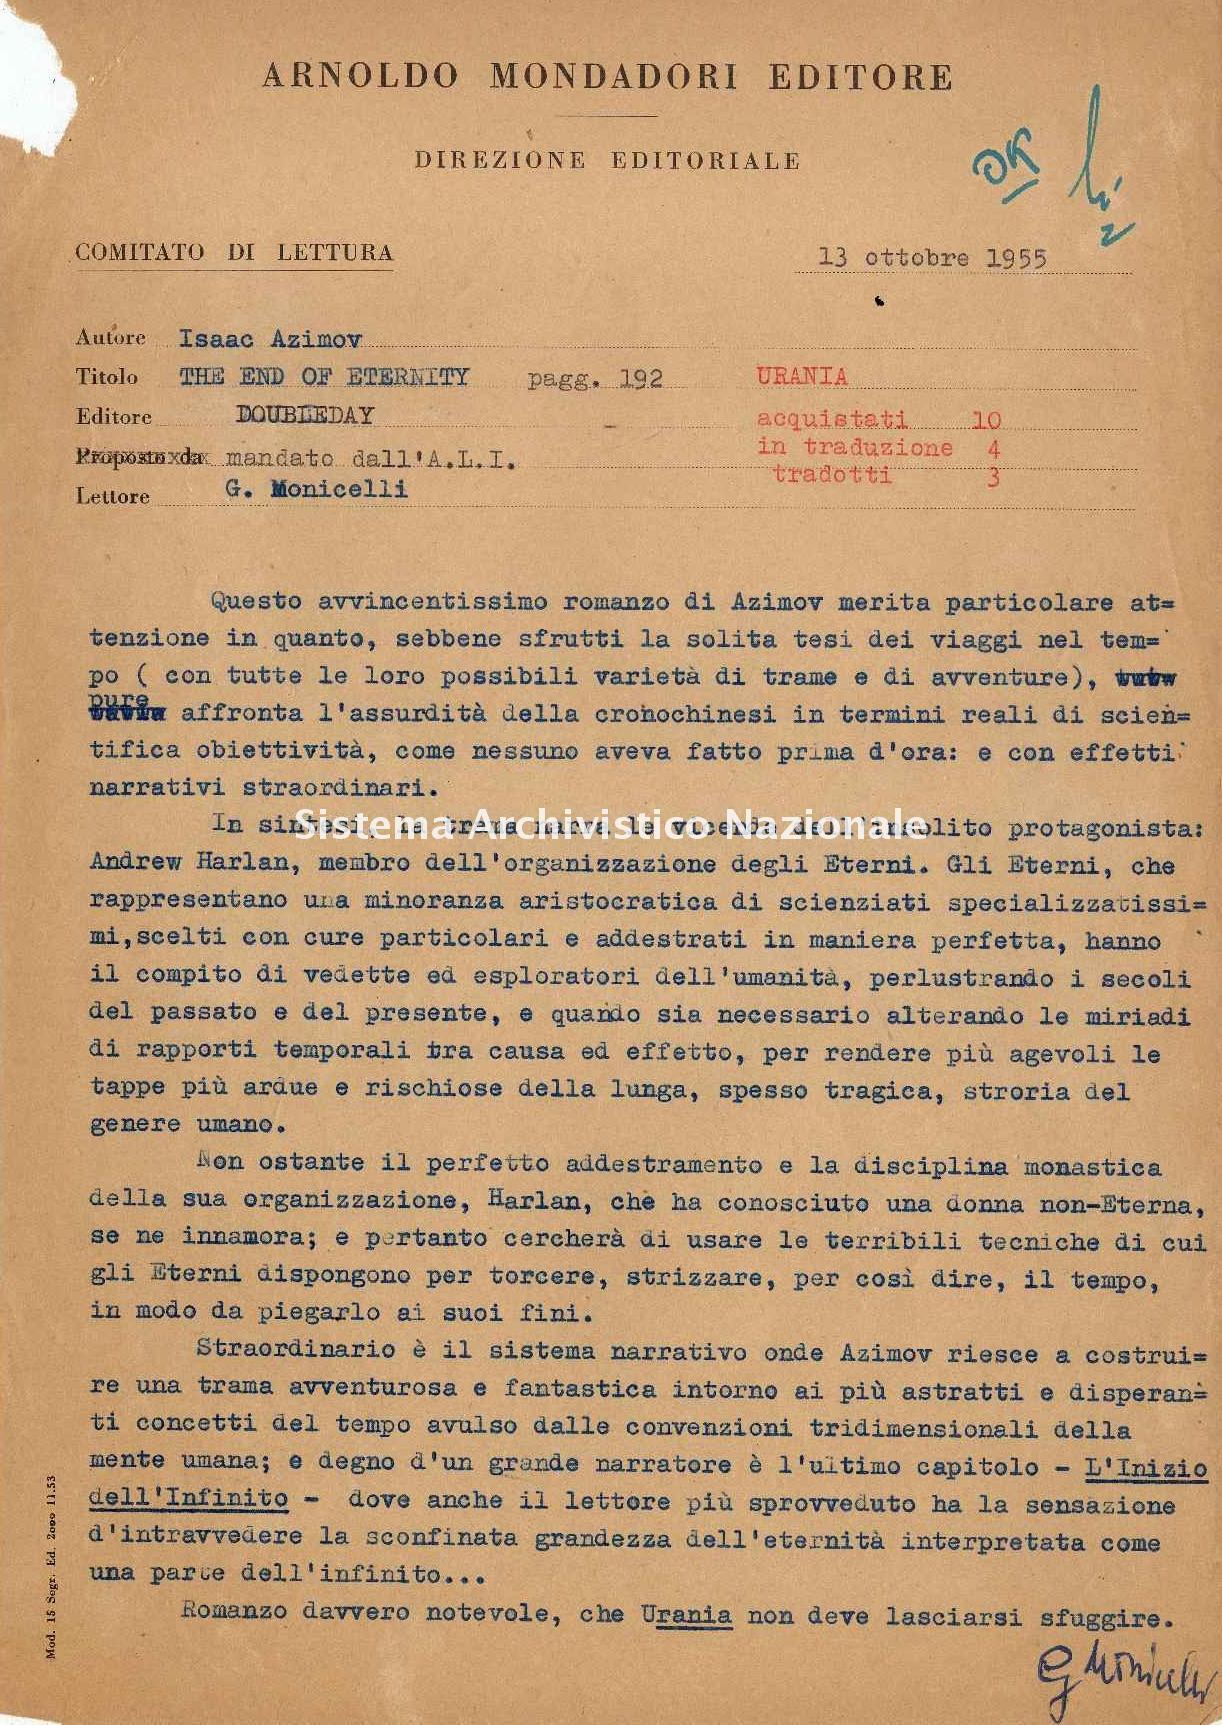 Mondadori, lettera, 1955